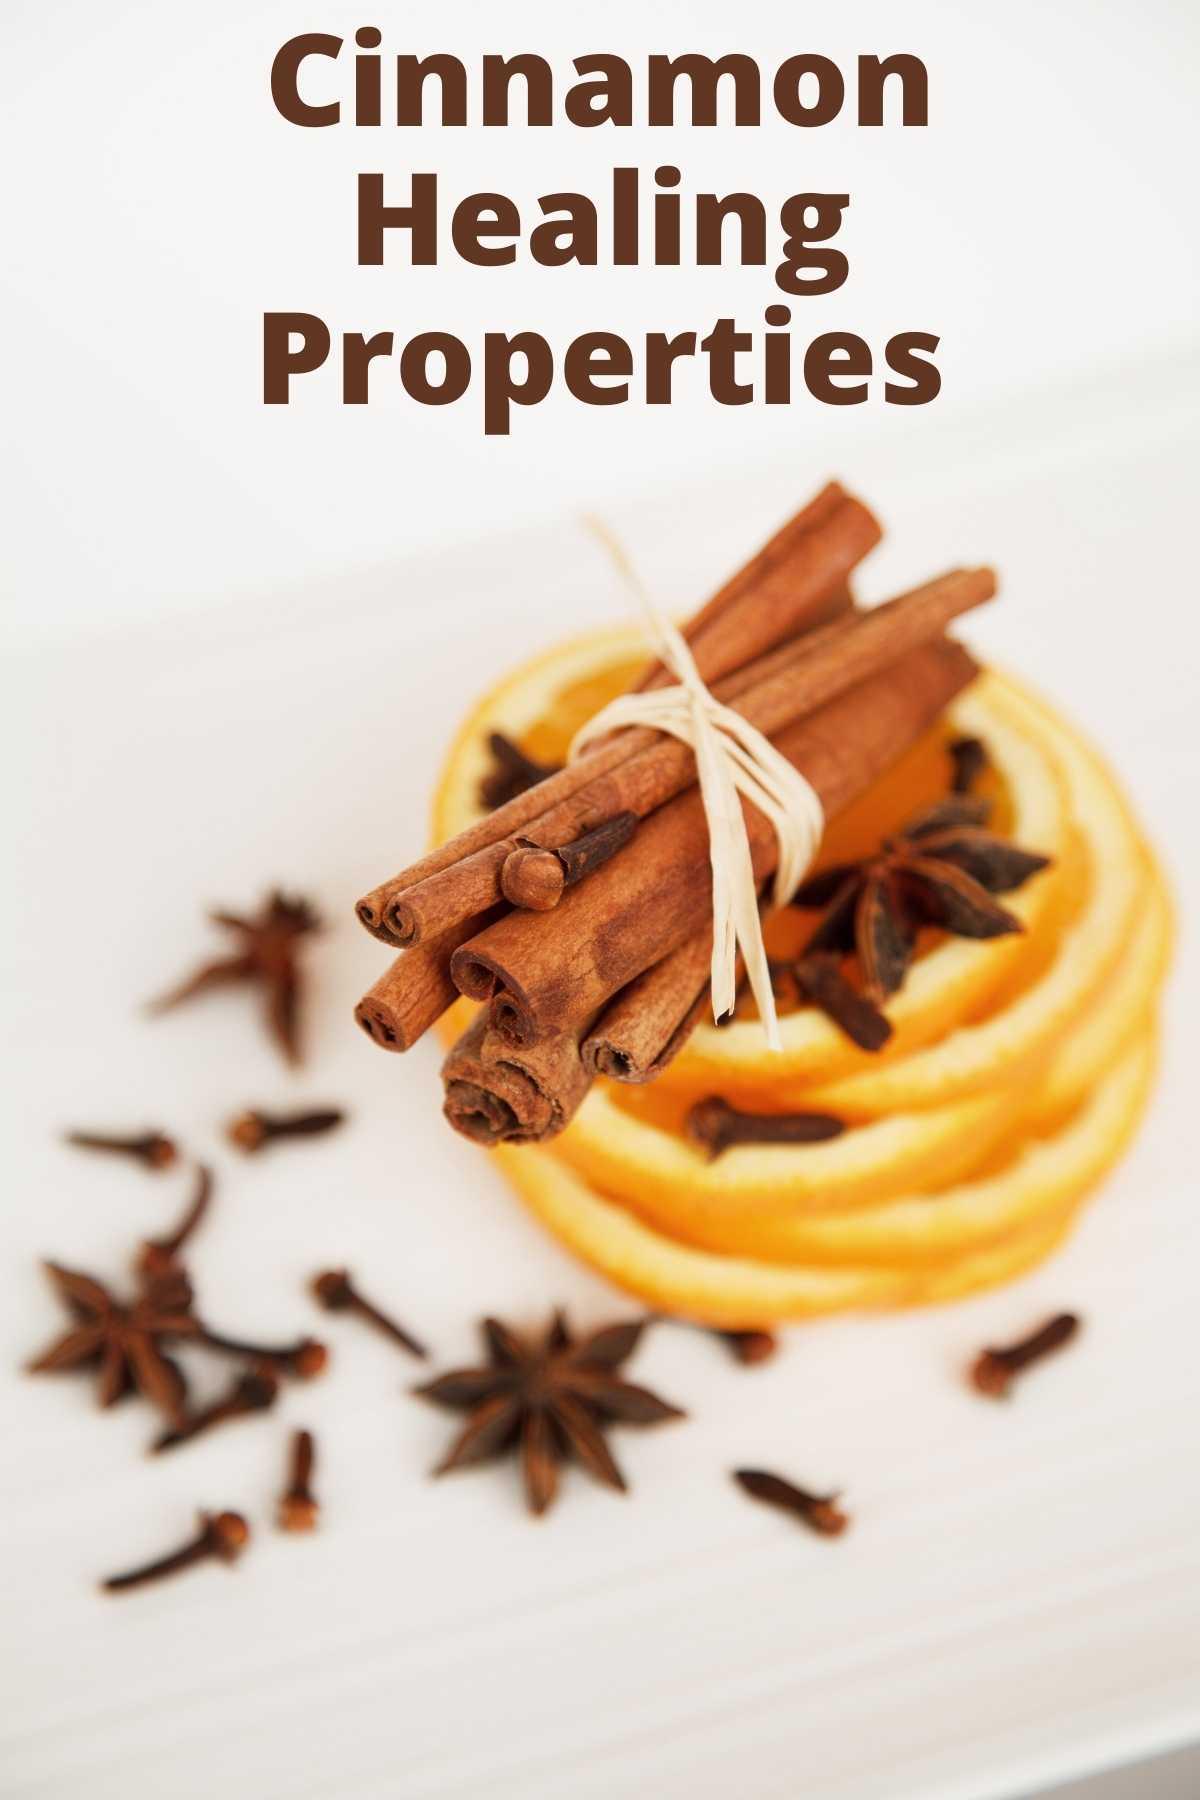 Cinnamon Healing Properties